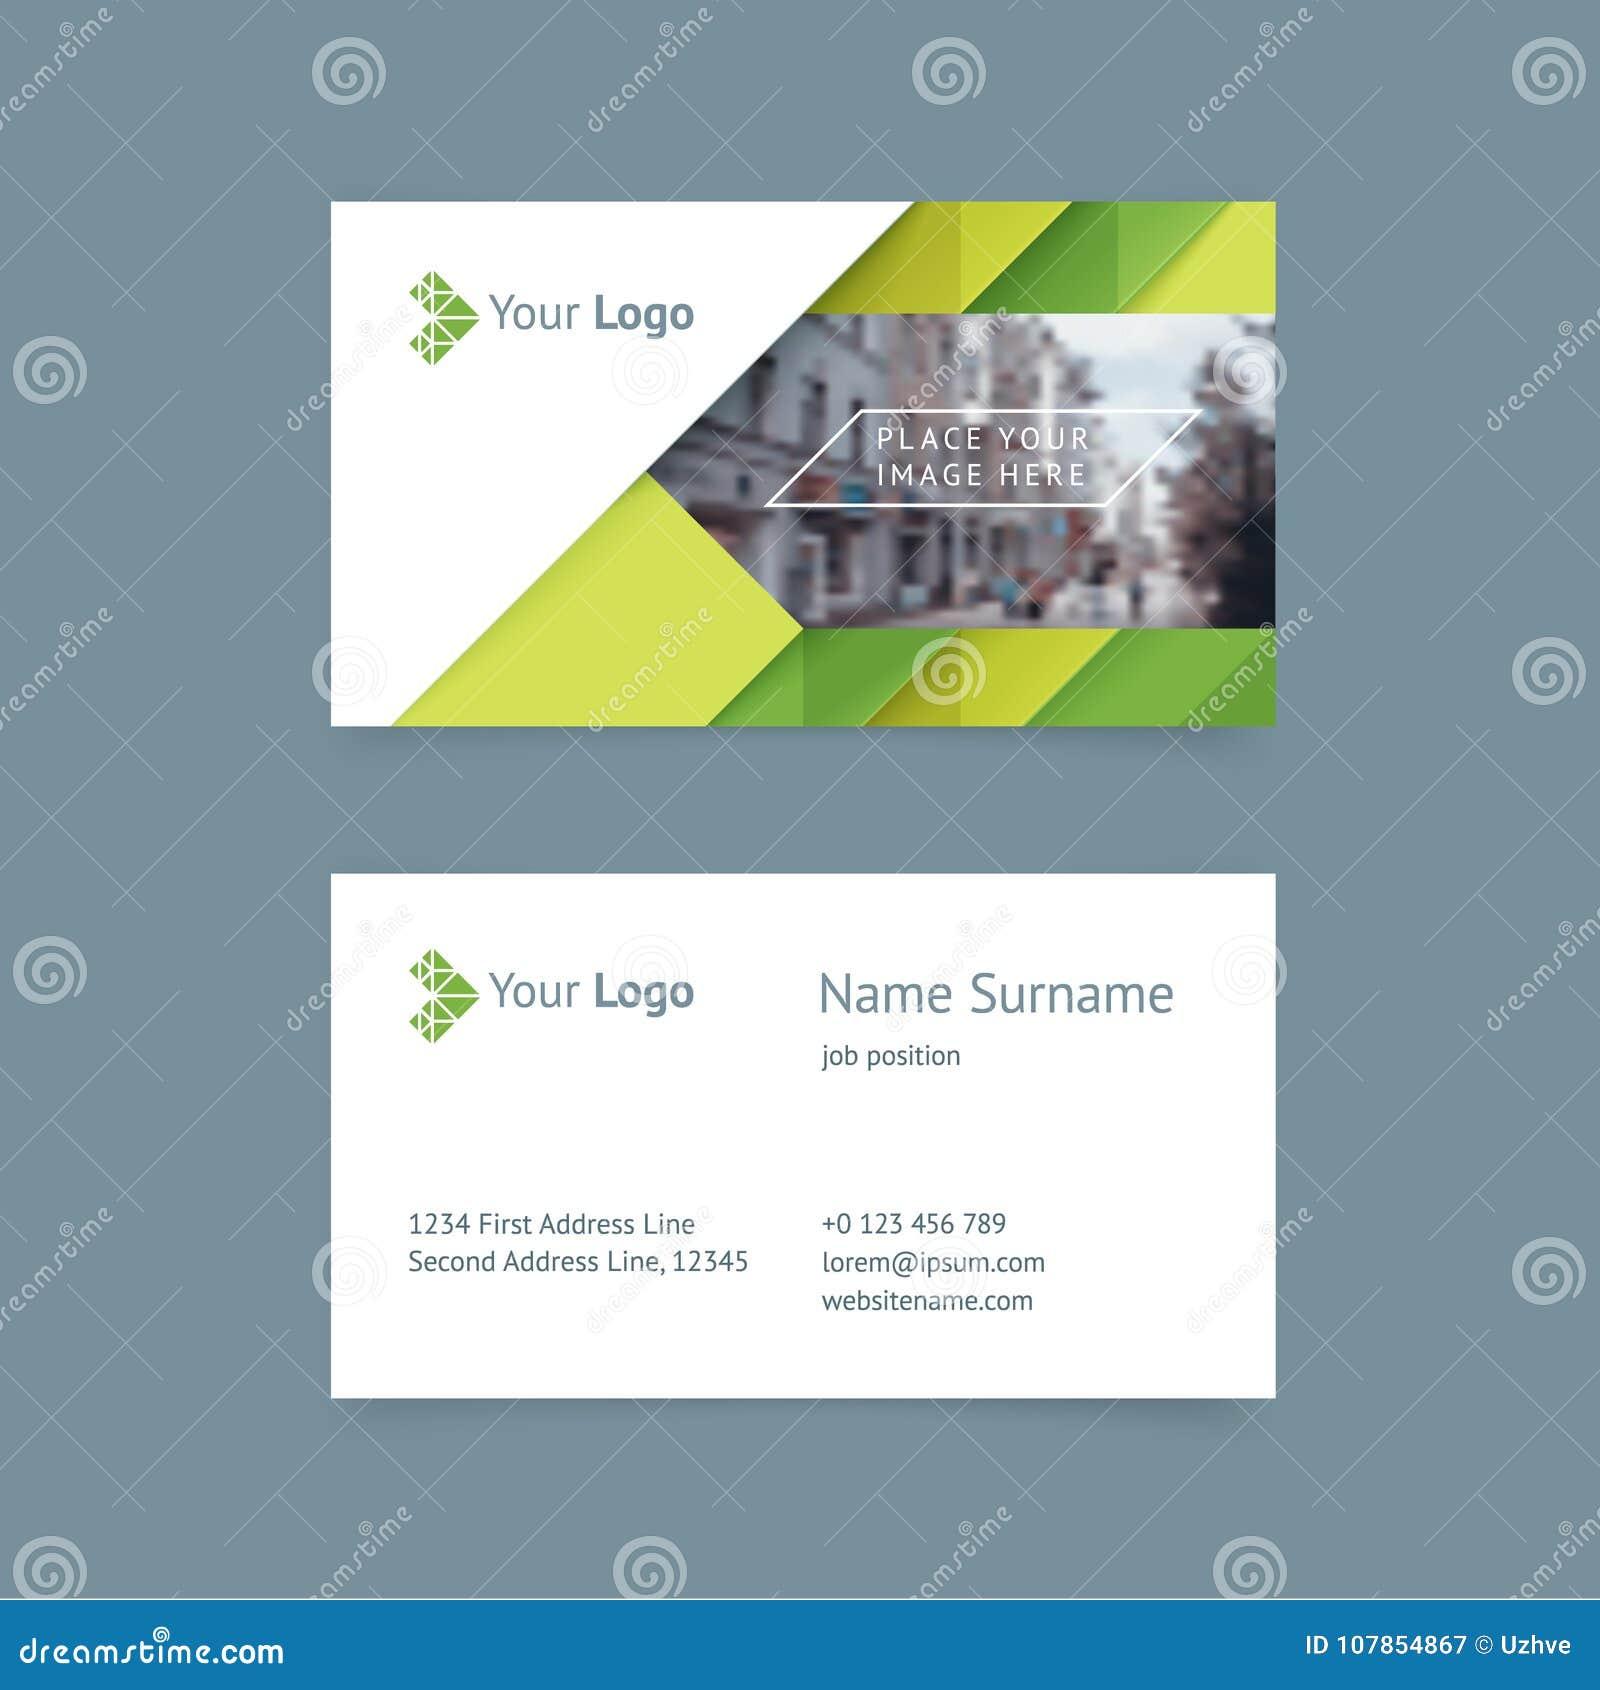 Vector Creative Business Card Template Stock Vector Illustration